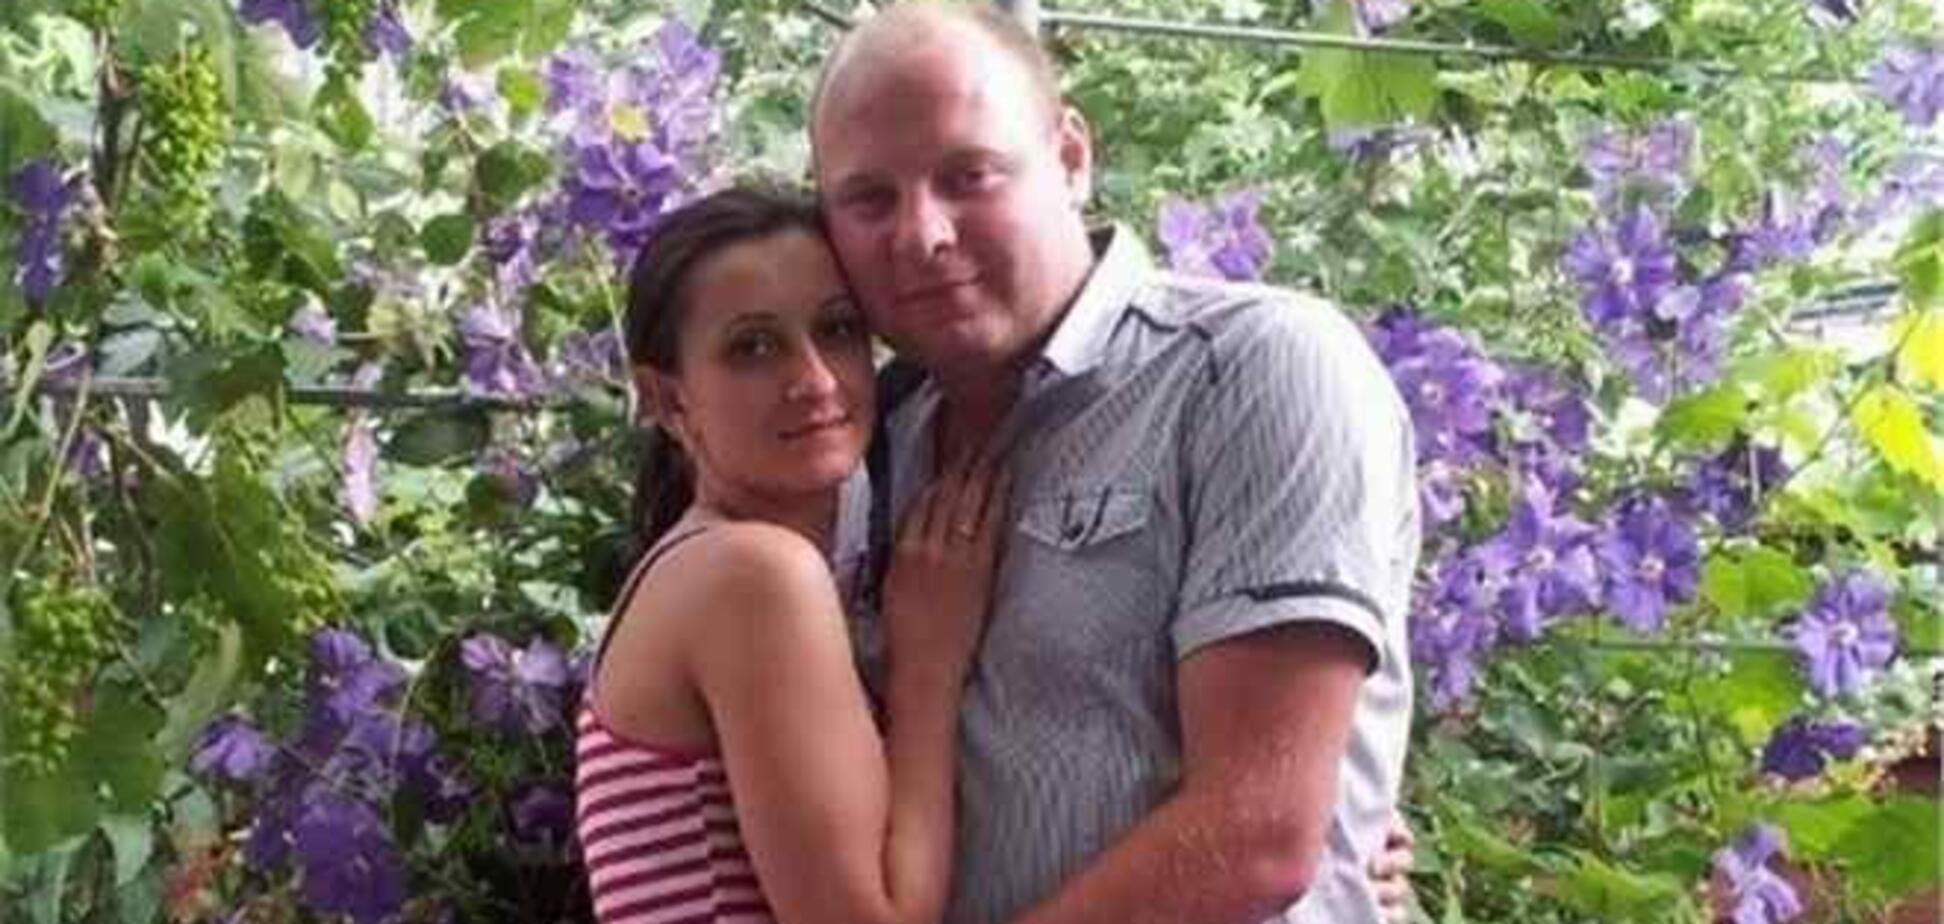 Девушка Дрижака: Крашкова три года бл**ствовала с моим отцом